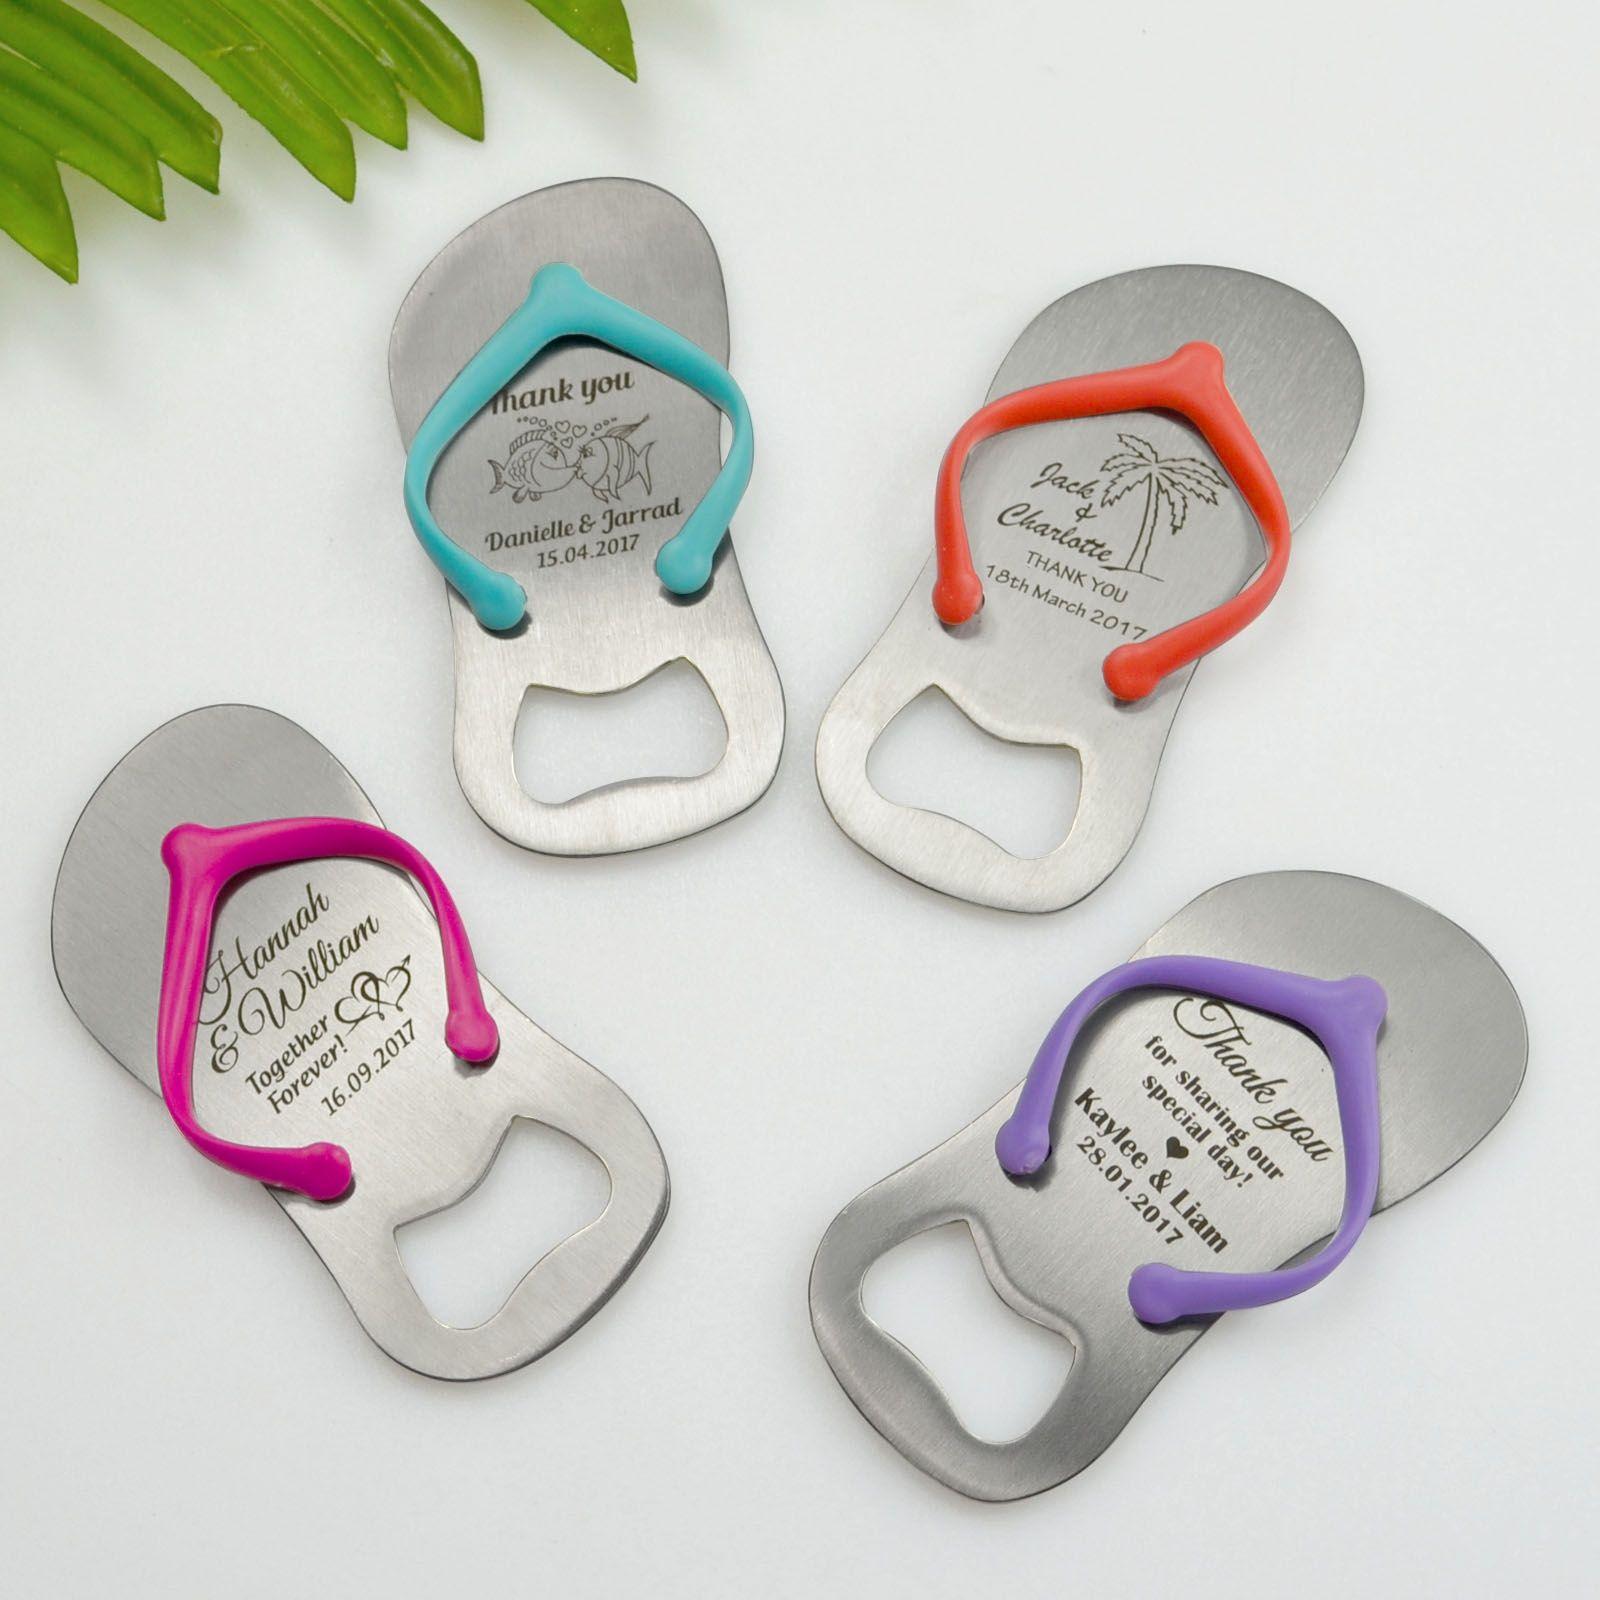 Thong (Flip Flop / Jandal) Bottle Opener | Things to Wear ...